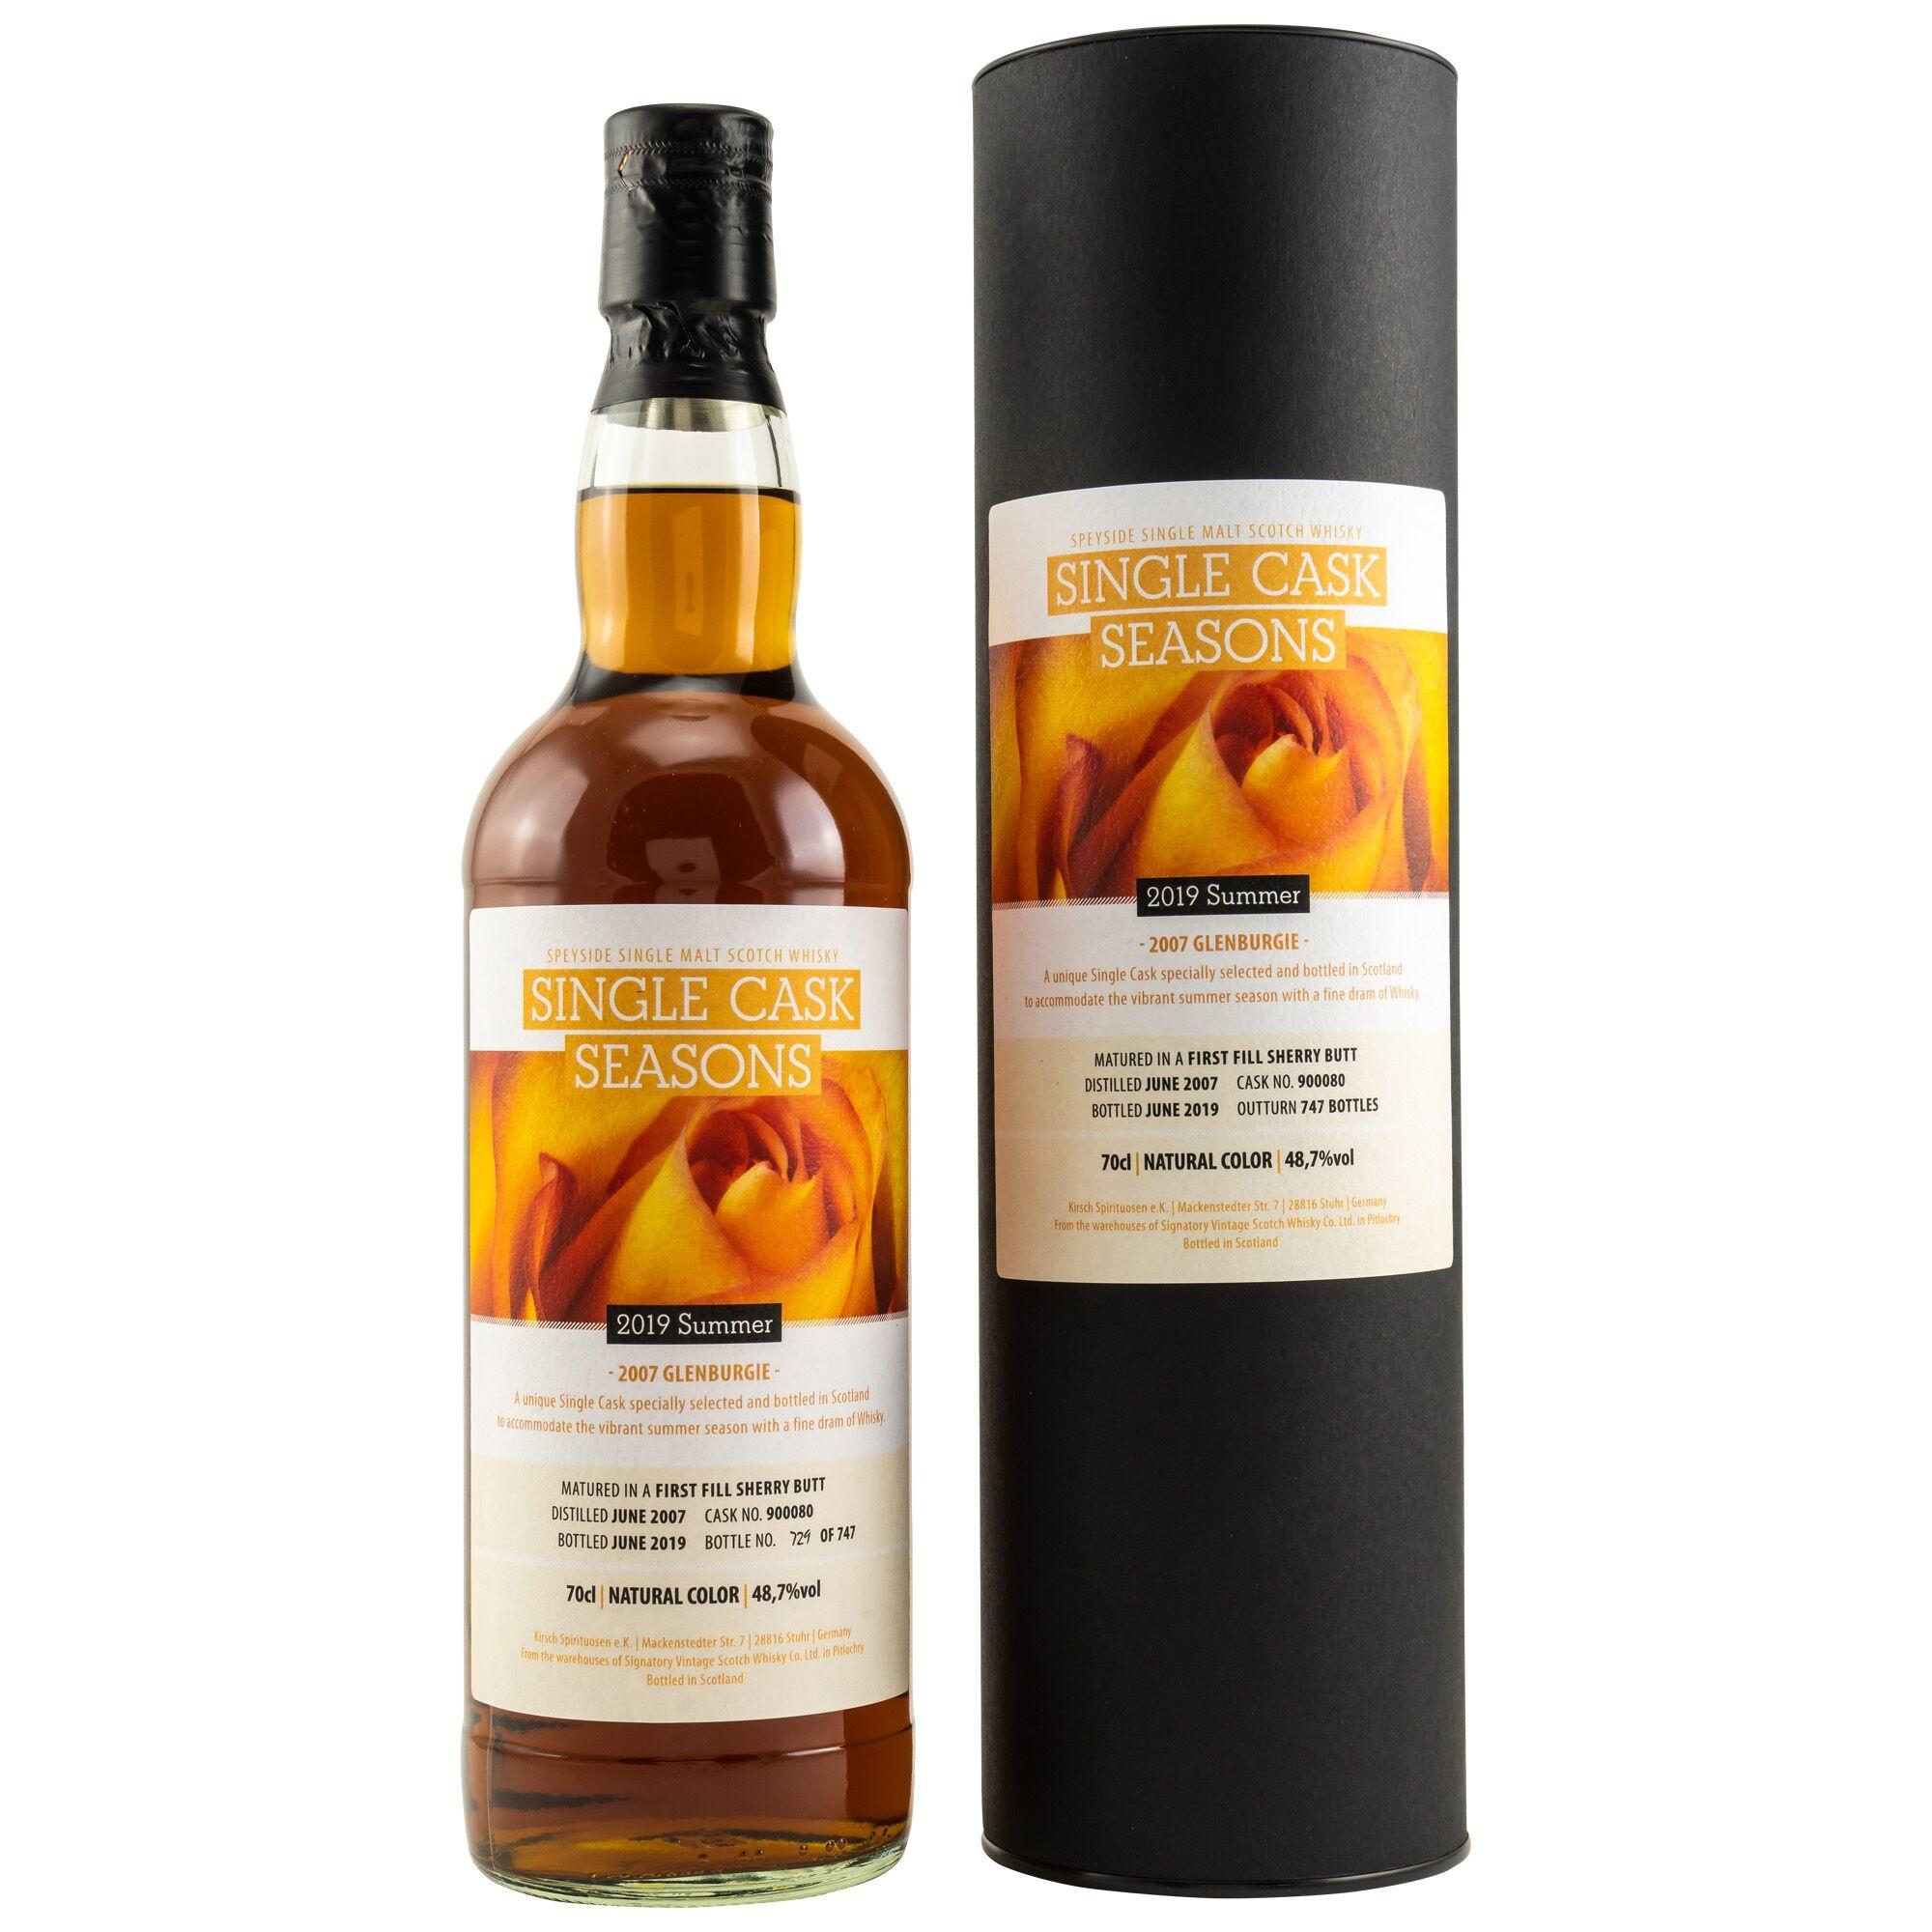 Neues von Kirsch Whisky: Single Cask Seasons Summer 2019: Glenburgie 2007/2019 1st Fill Sherry Butt